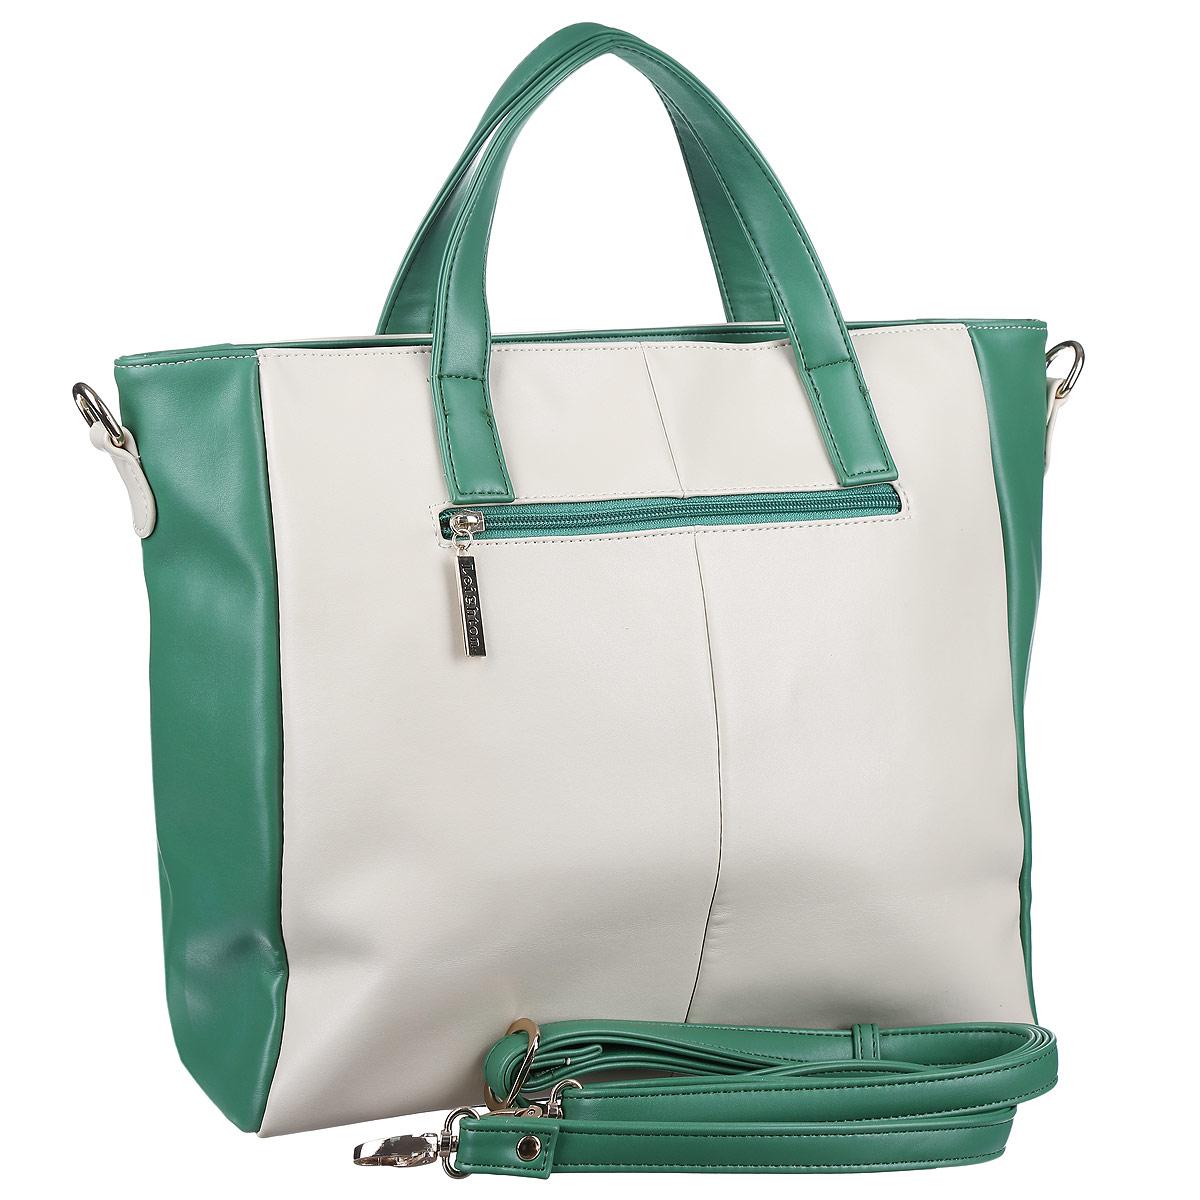 Сумка женская Leighton, цвет: молочный, зеленый. 10642-082 ( 10642-082/11/082/740 беж/ )